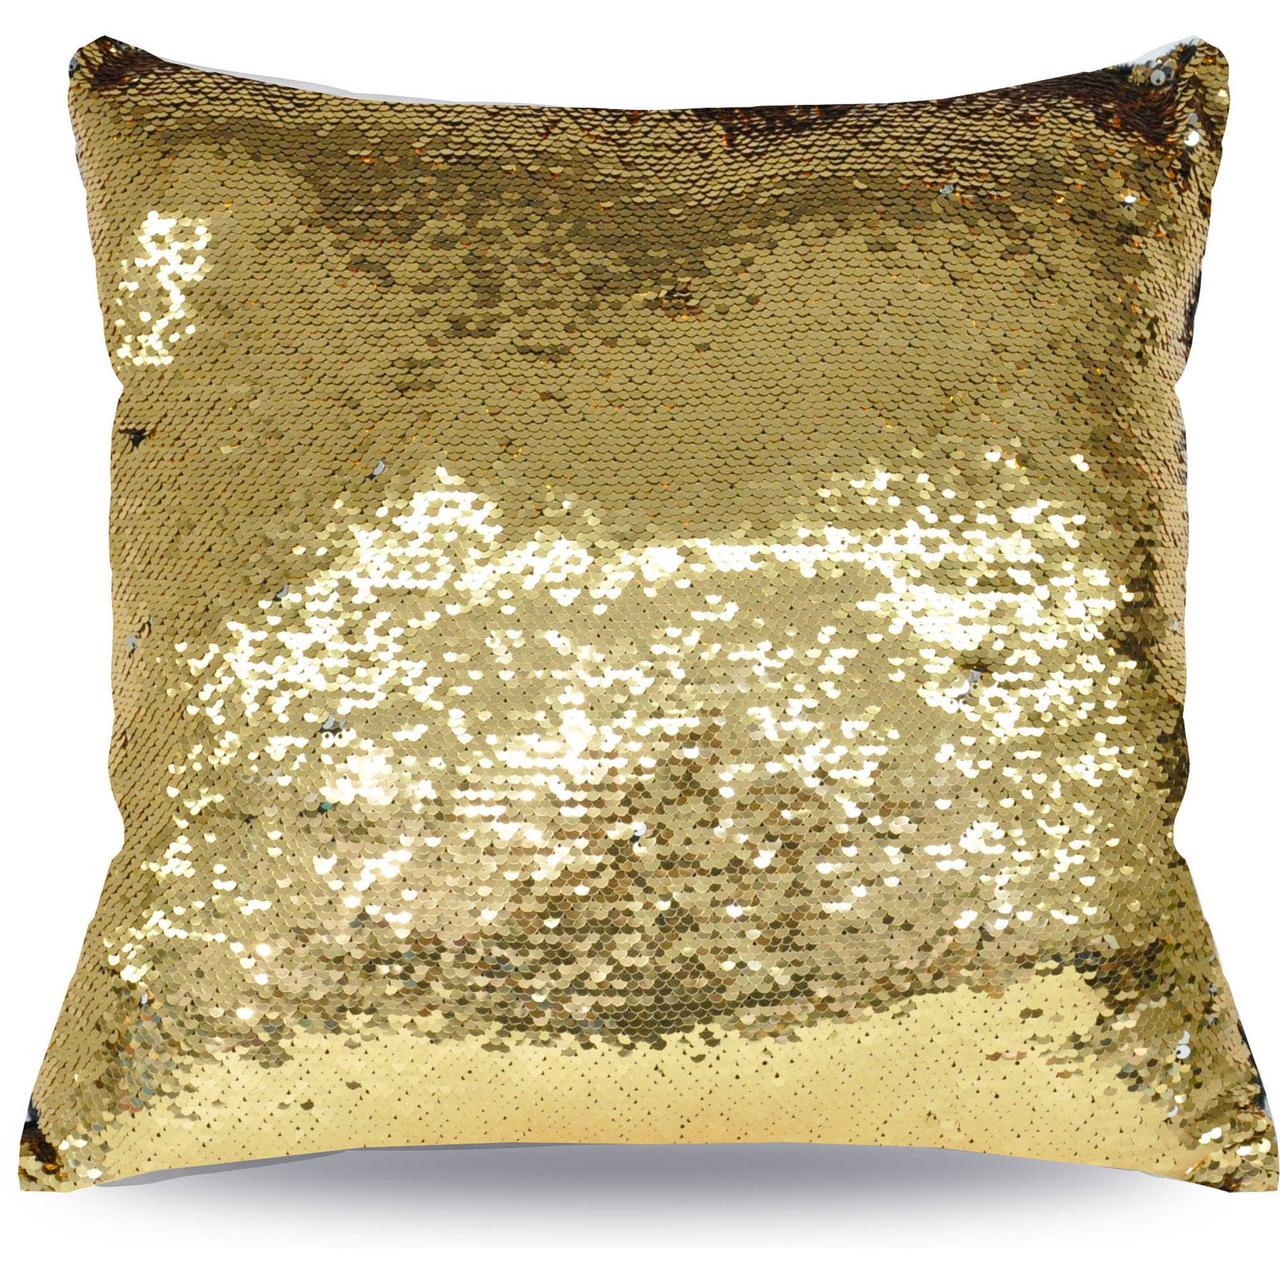 Подушка для сублимации с пайетками 40х40 (Золото/Белый)